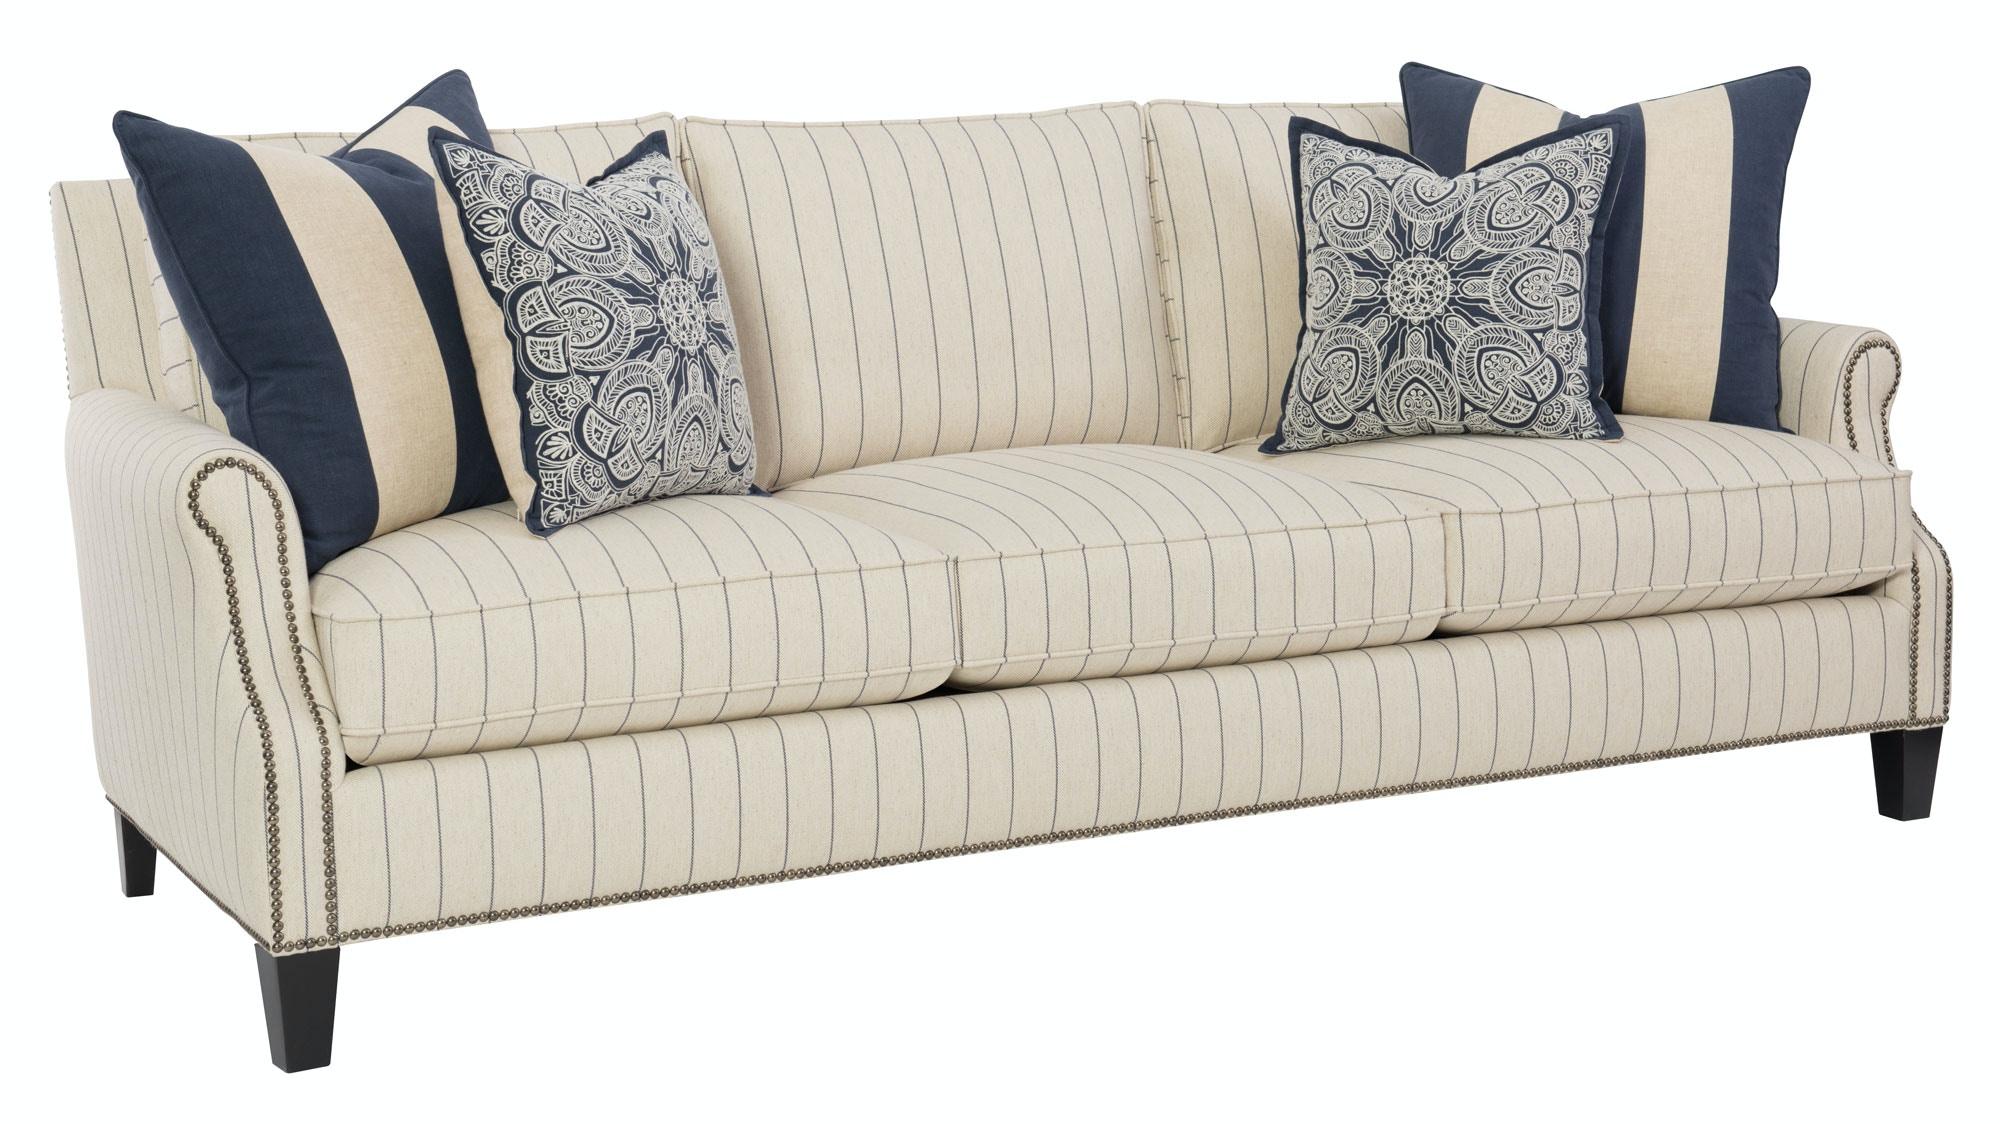 Hollis Sofa By Bernhardt Interiors Original Franco Sleeper Sofa